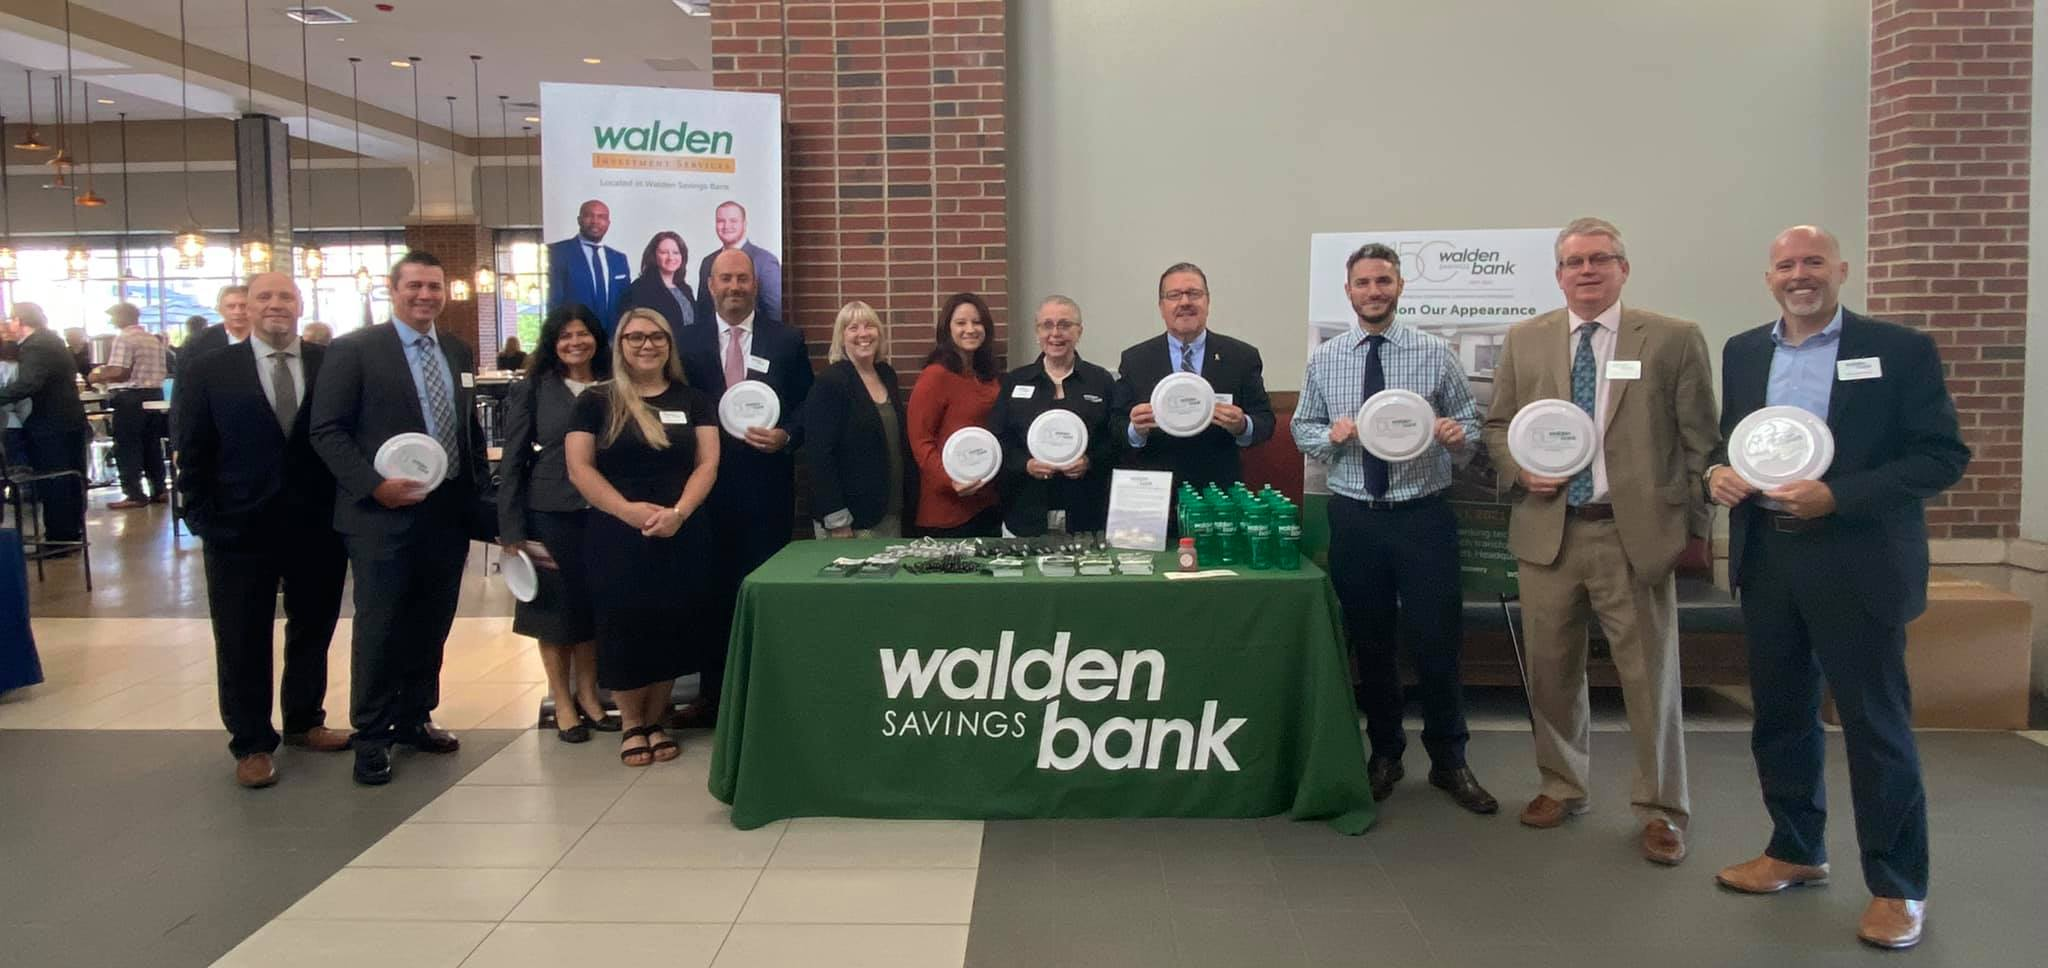 WALDEN SAVINGS BANK SPONSORS CHAMBER BREAKFAST